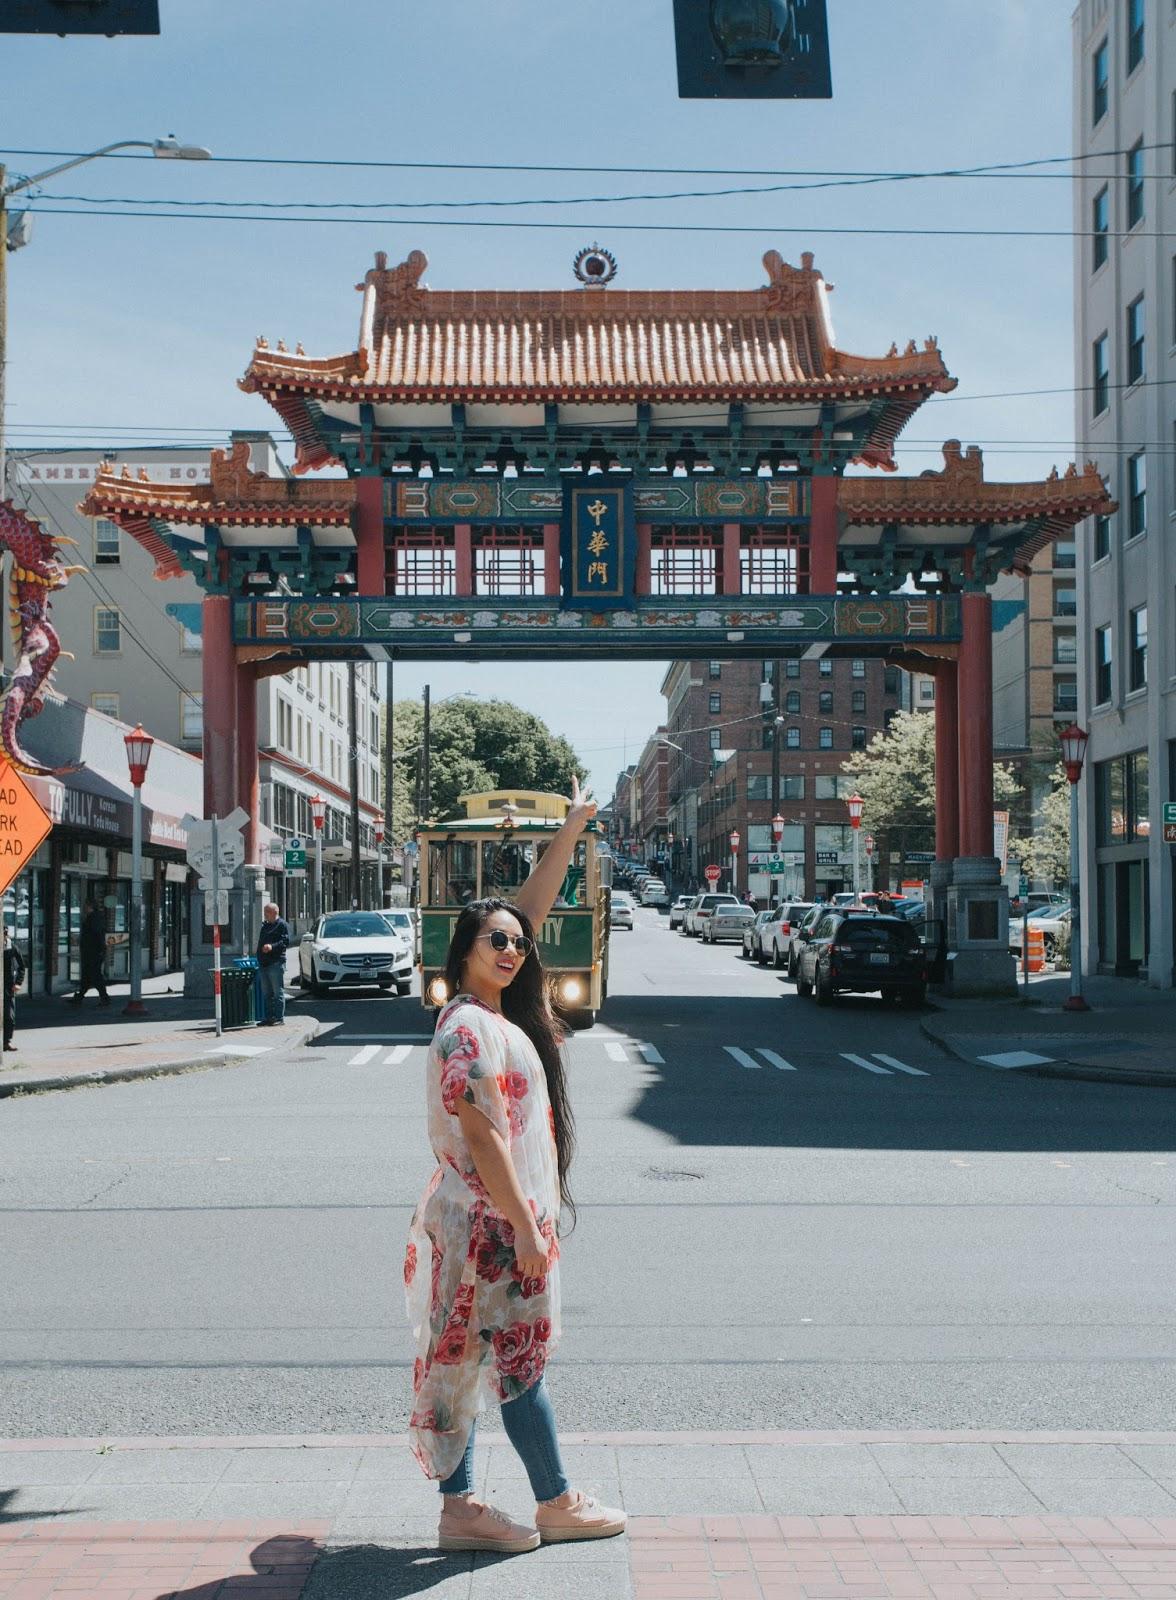 band of gypsies historic chinatown gate